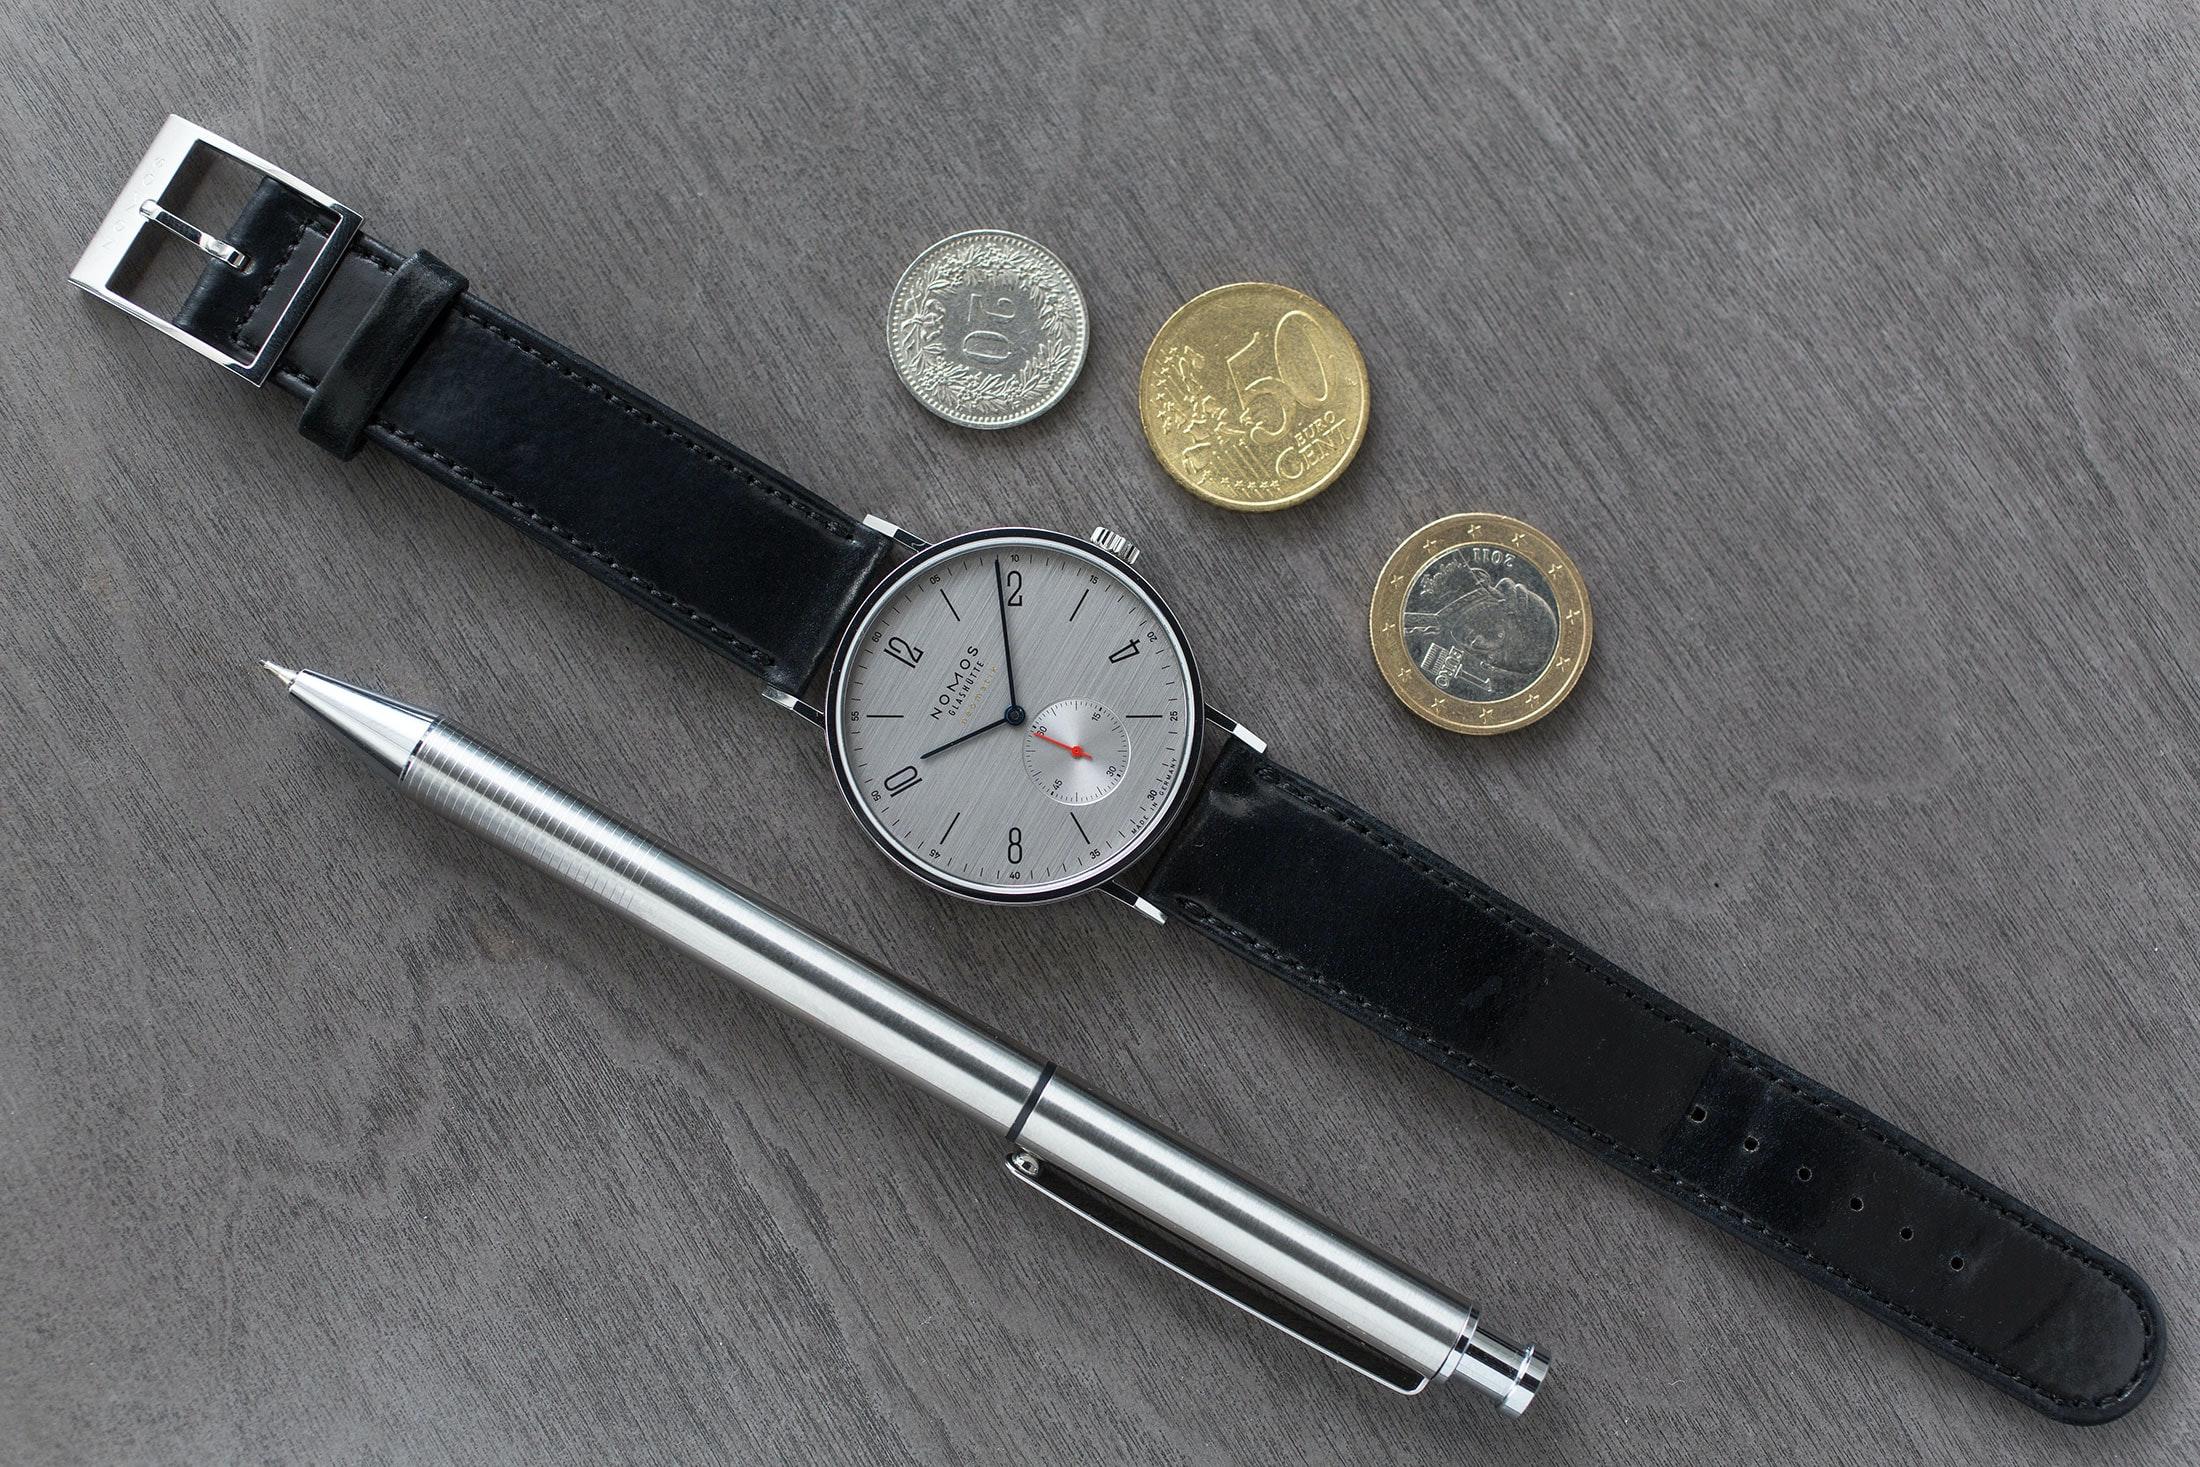 Hands-On: The NOMOS Glashütte Tangente Neomatik 39 Silvercut